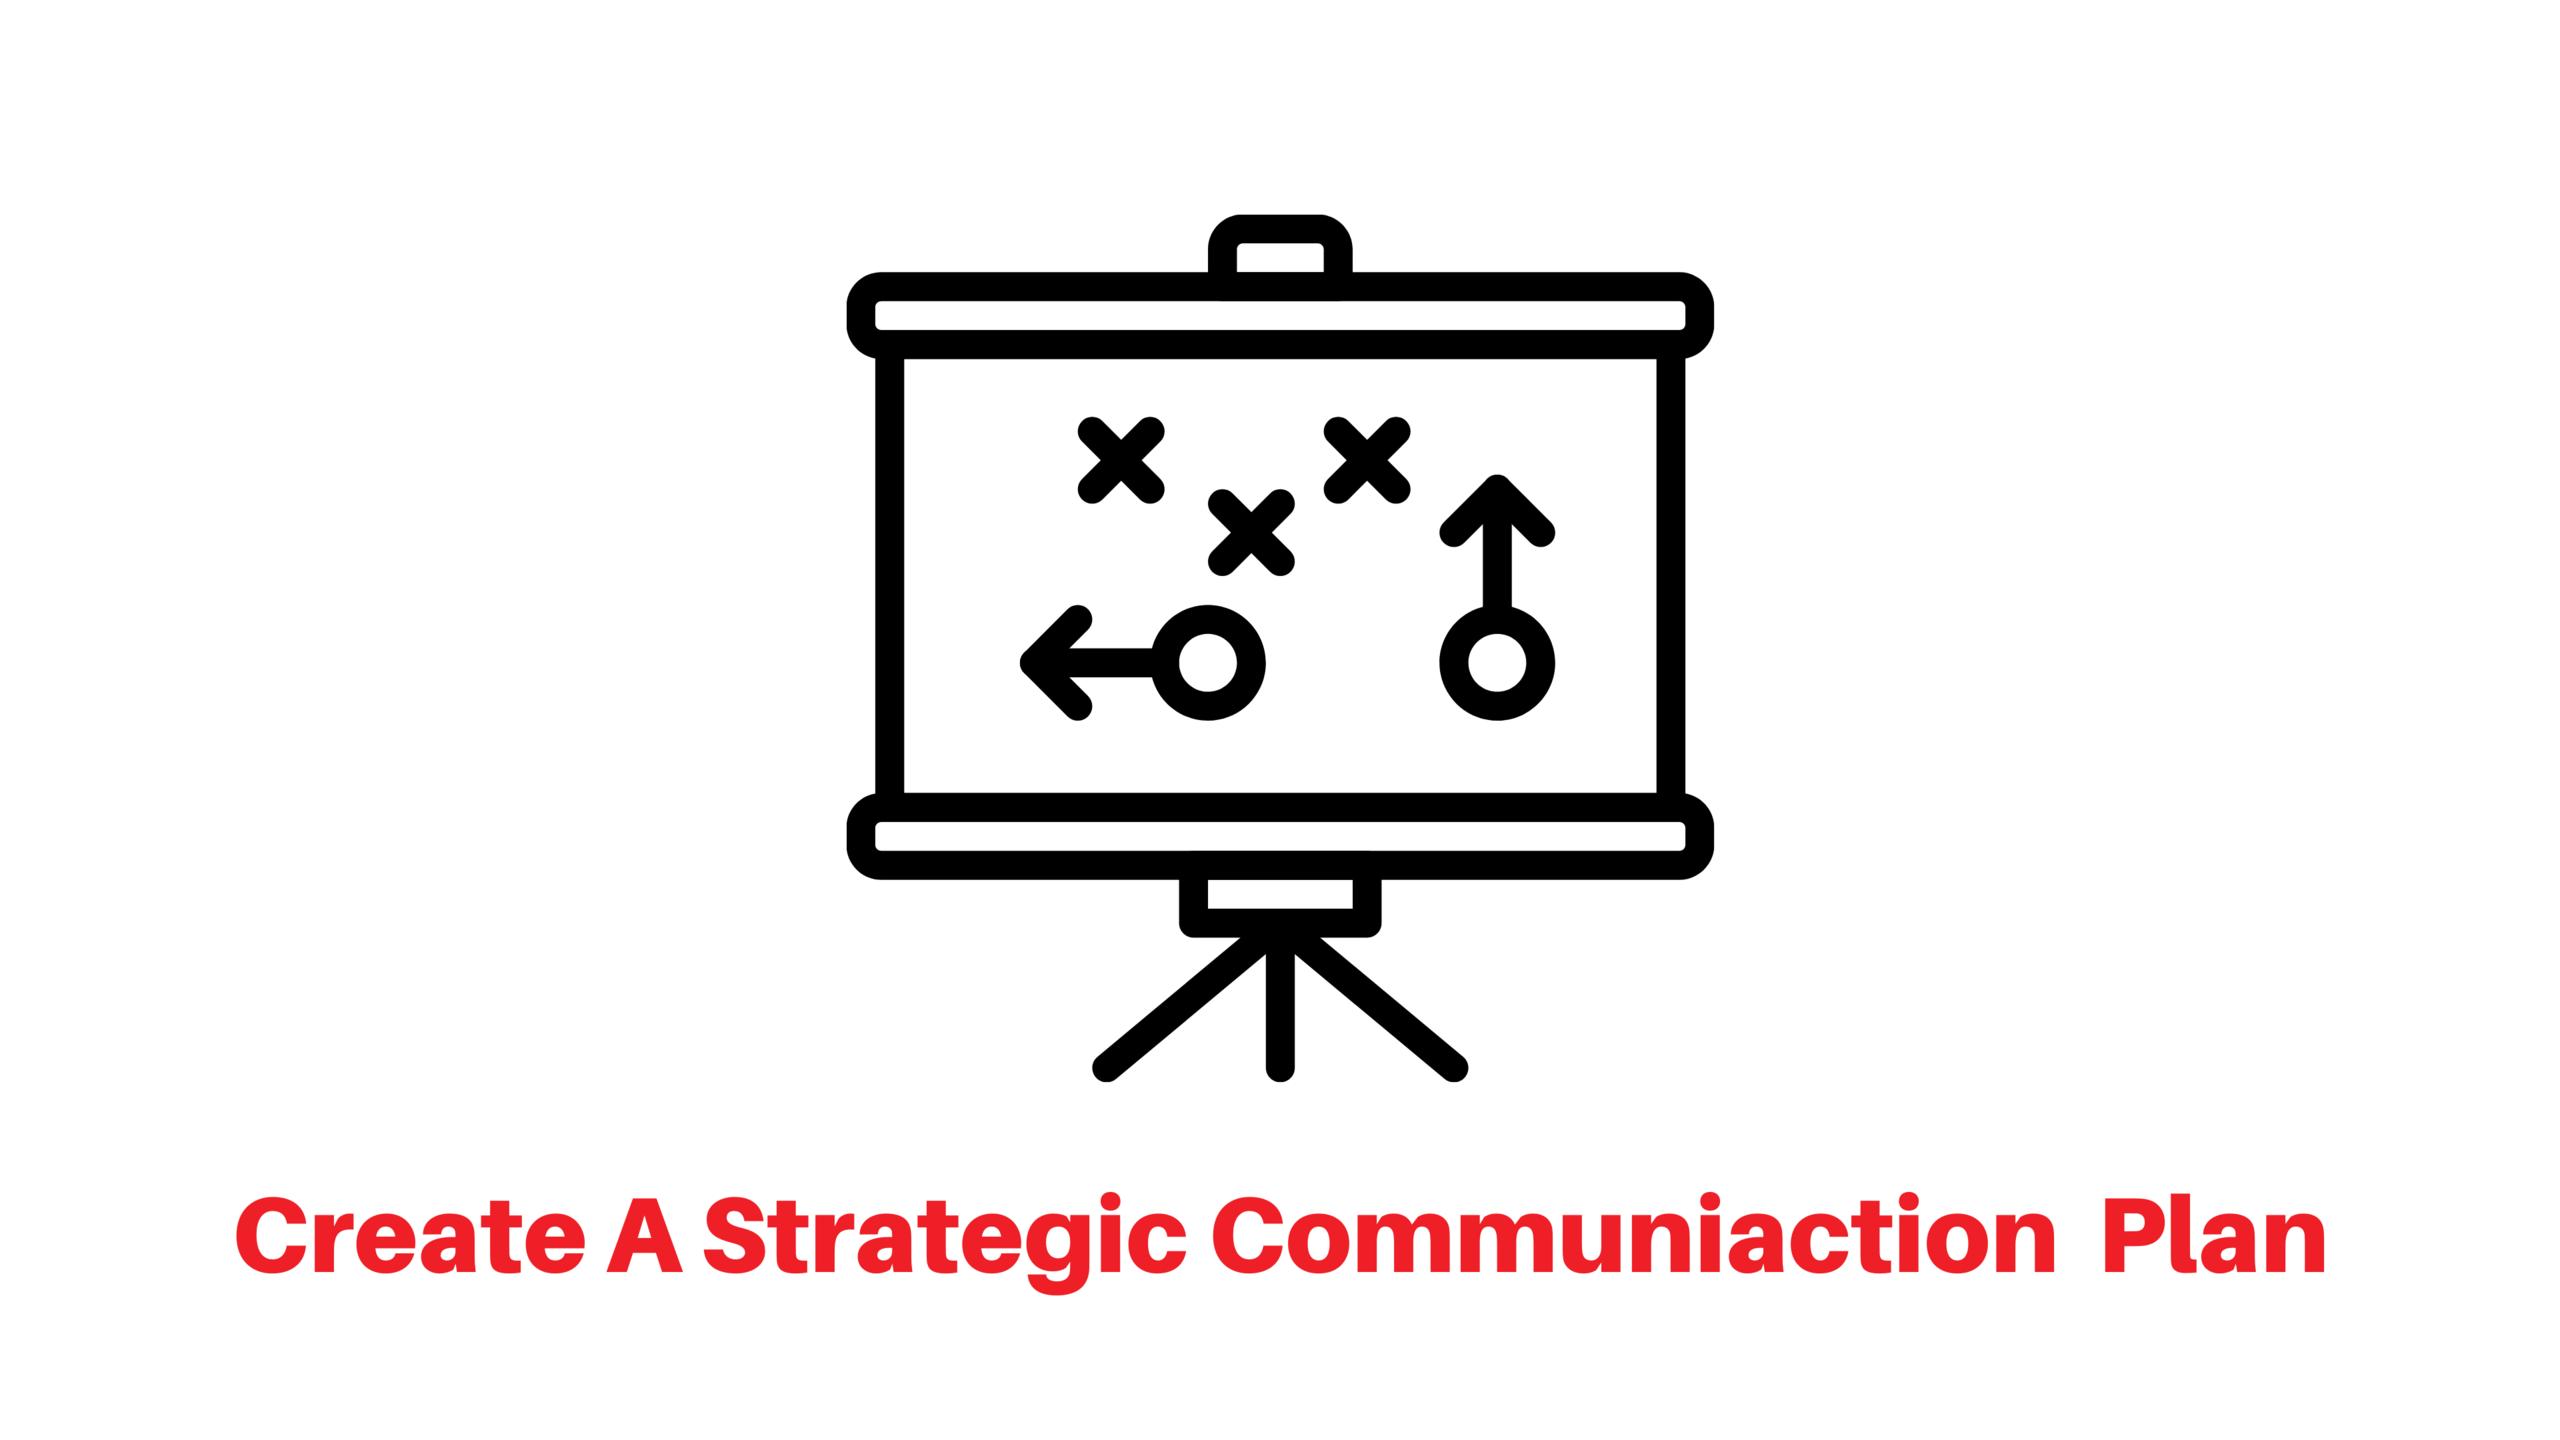 Create a strategic communication plan